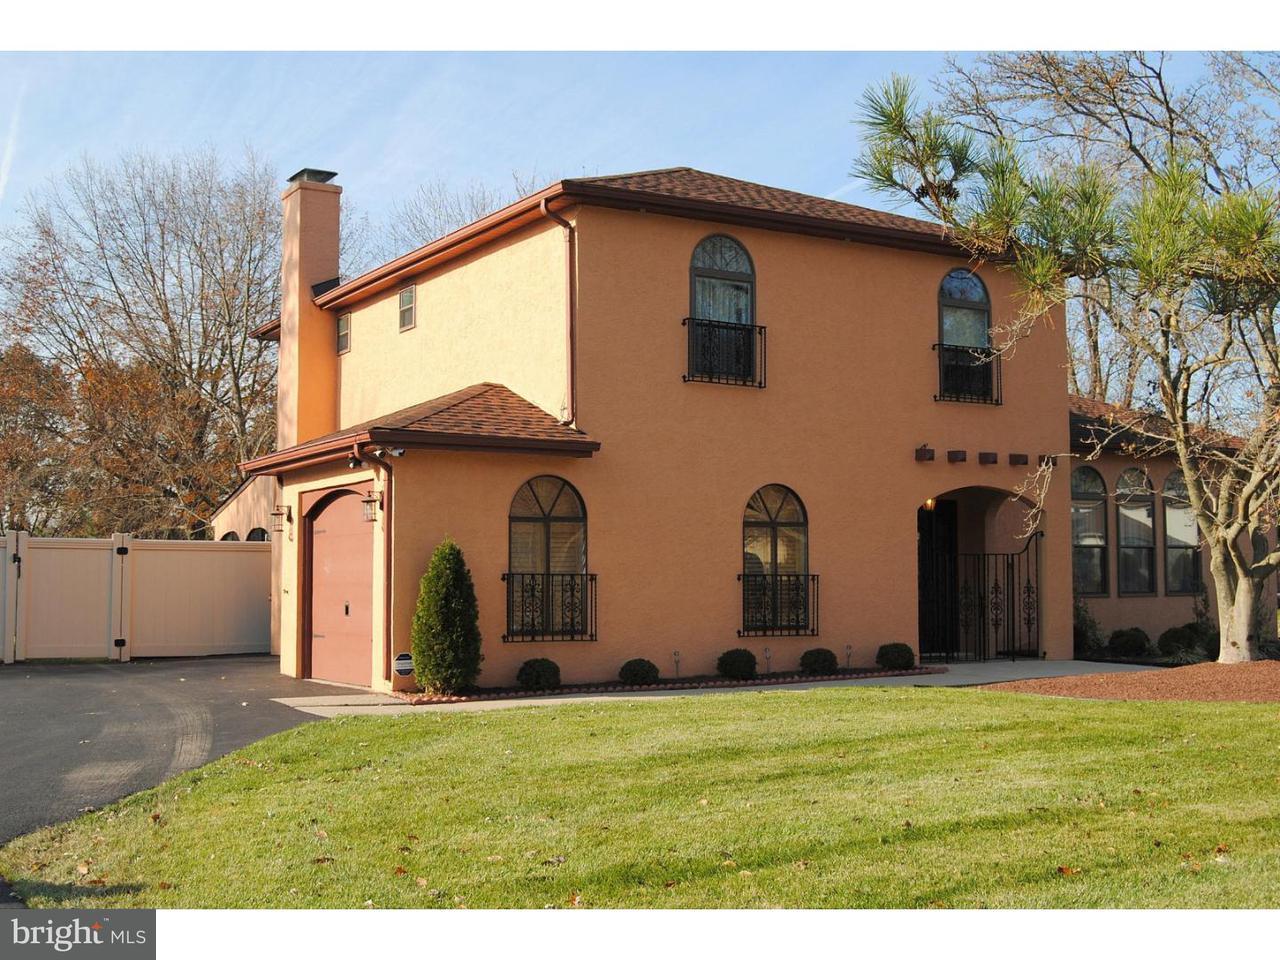 Single Family Home for Sale at 78 CAROL Lane Northampton, Pennsylvania 18954 United States